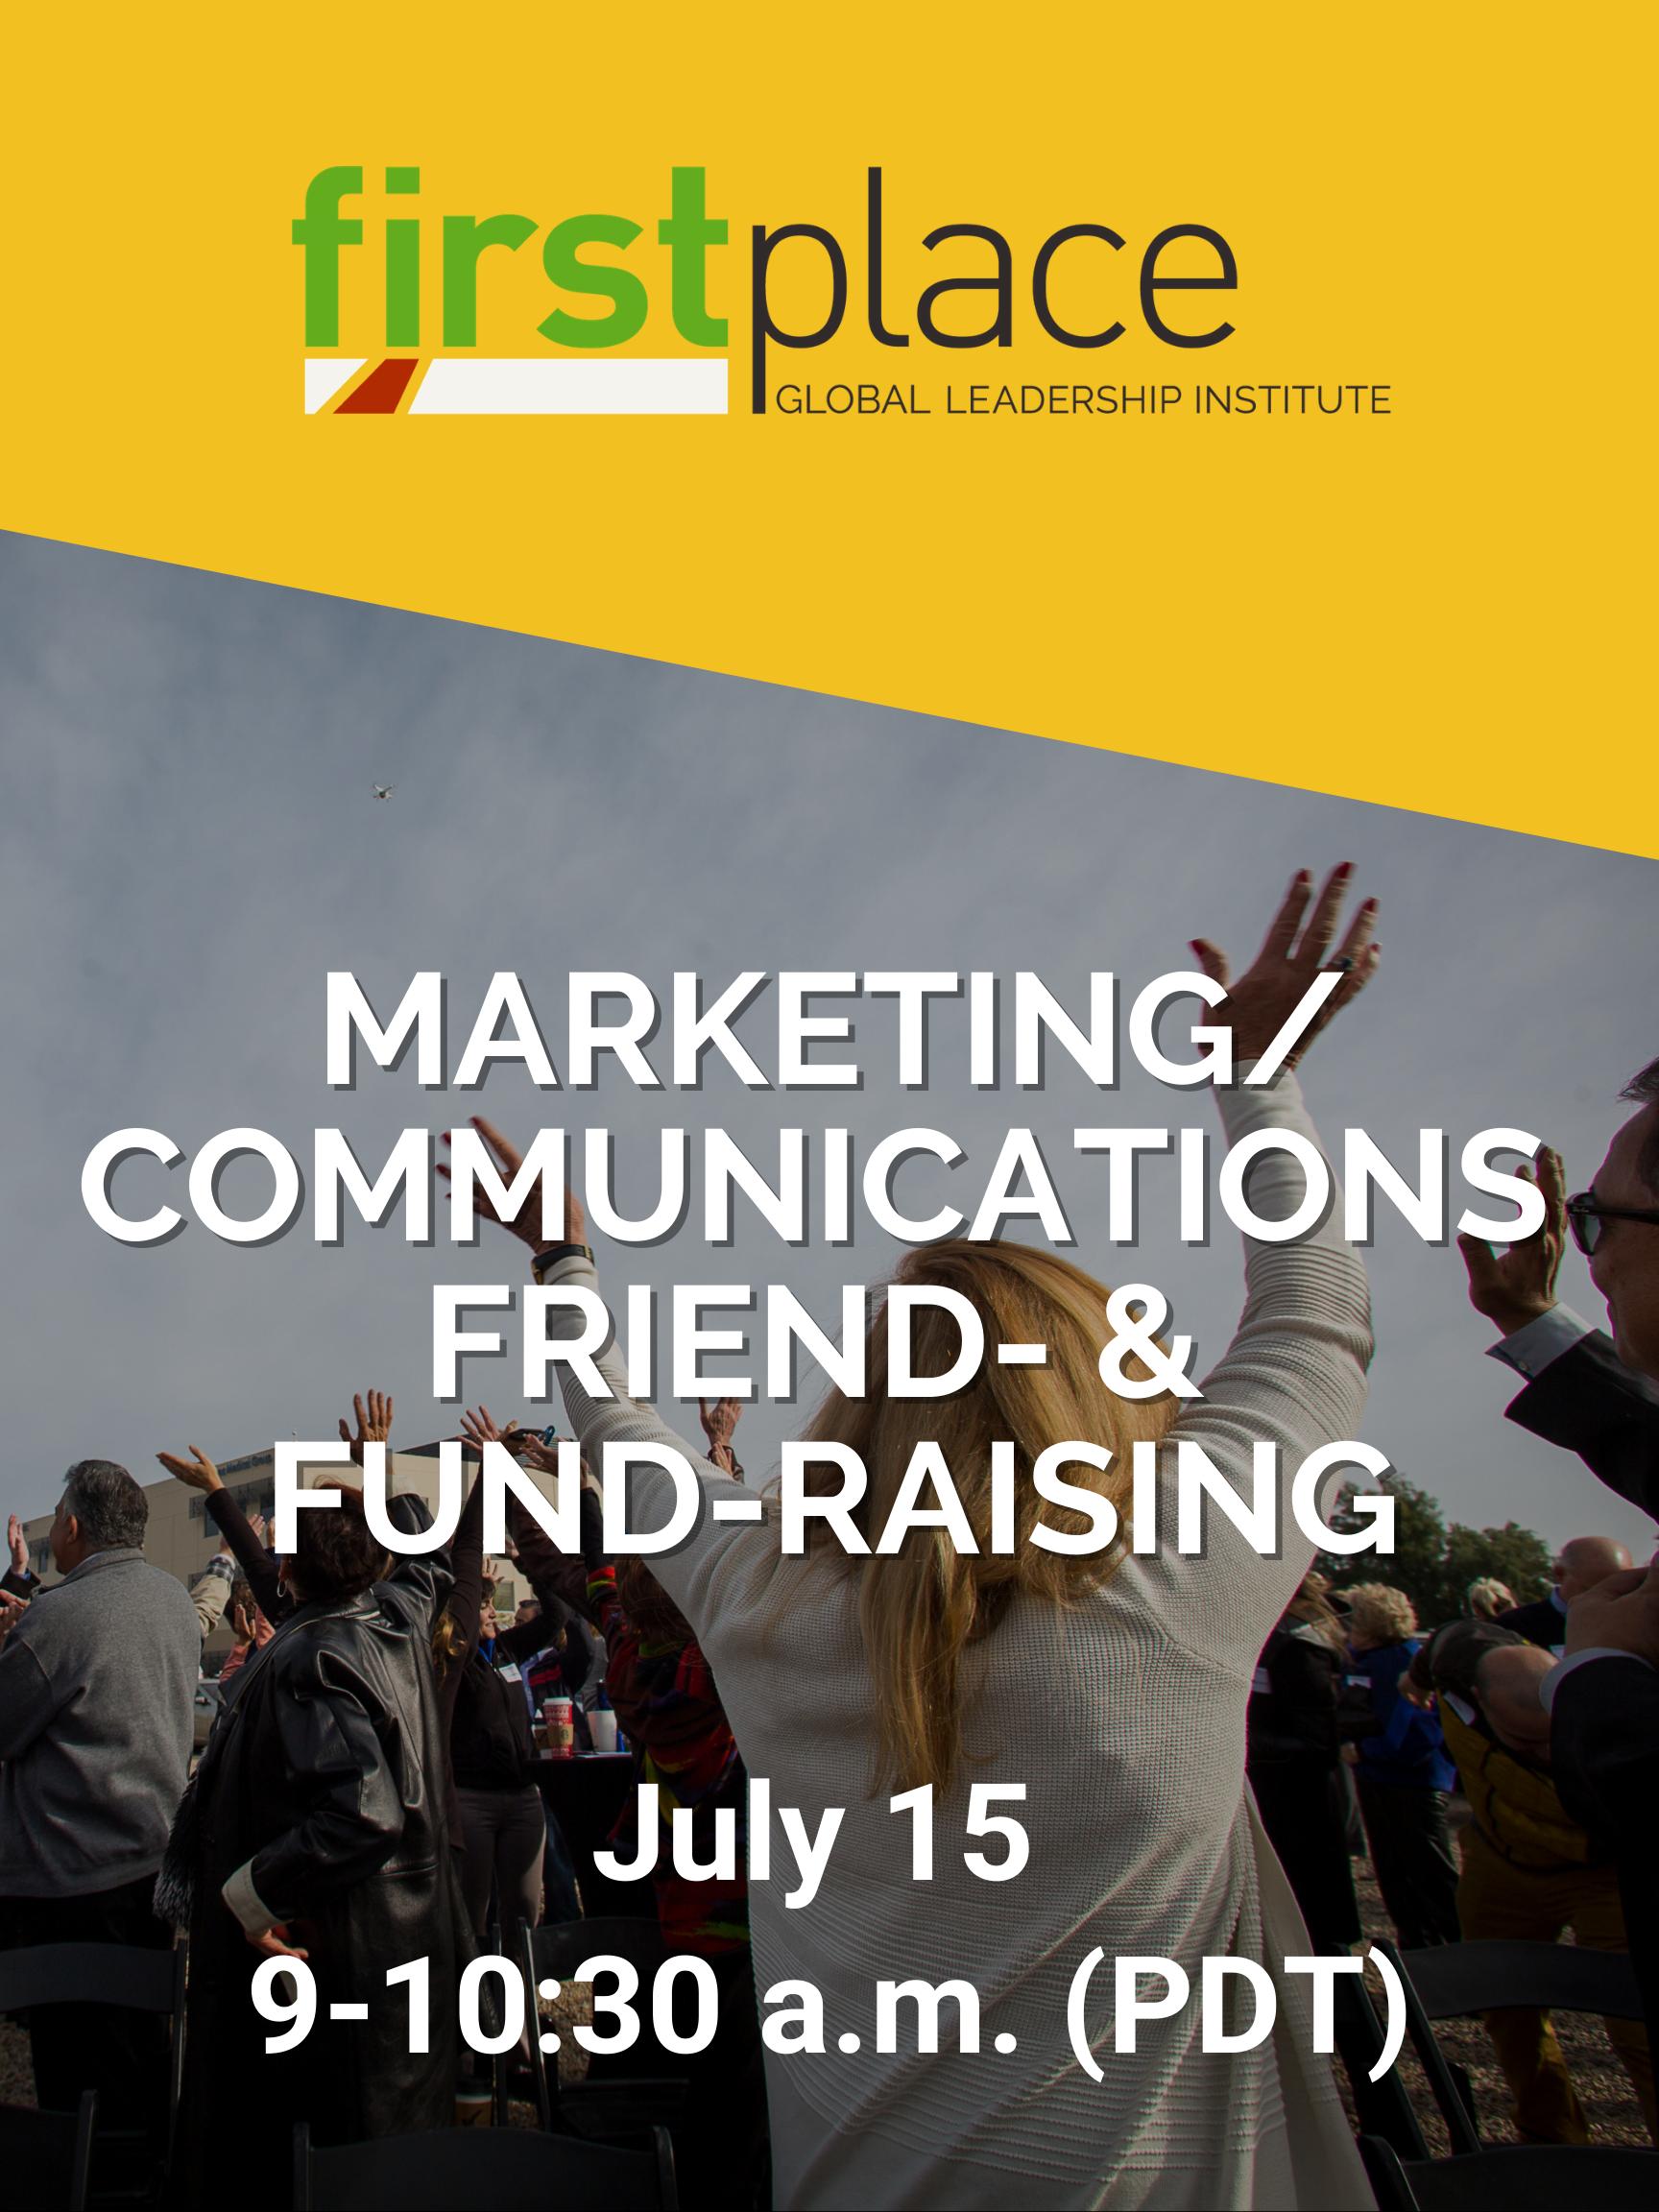 Marketing/Communications Friend- & Fund-Raising - July 15, 9 a.m. (PDT)